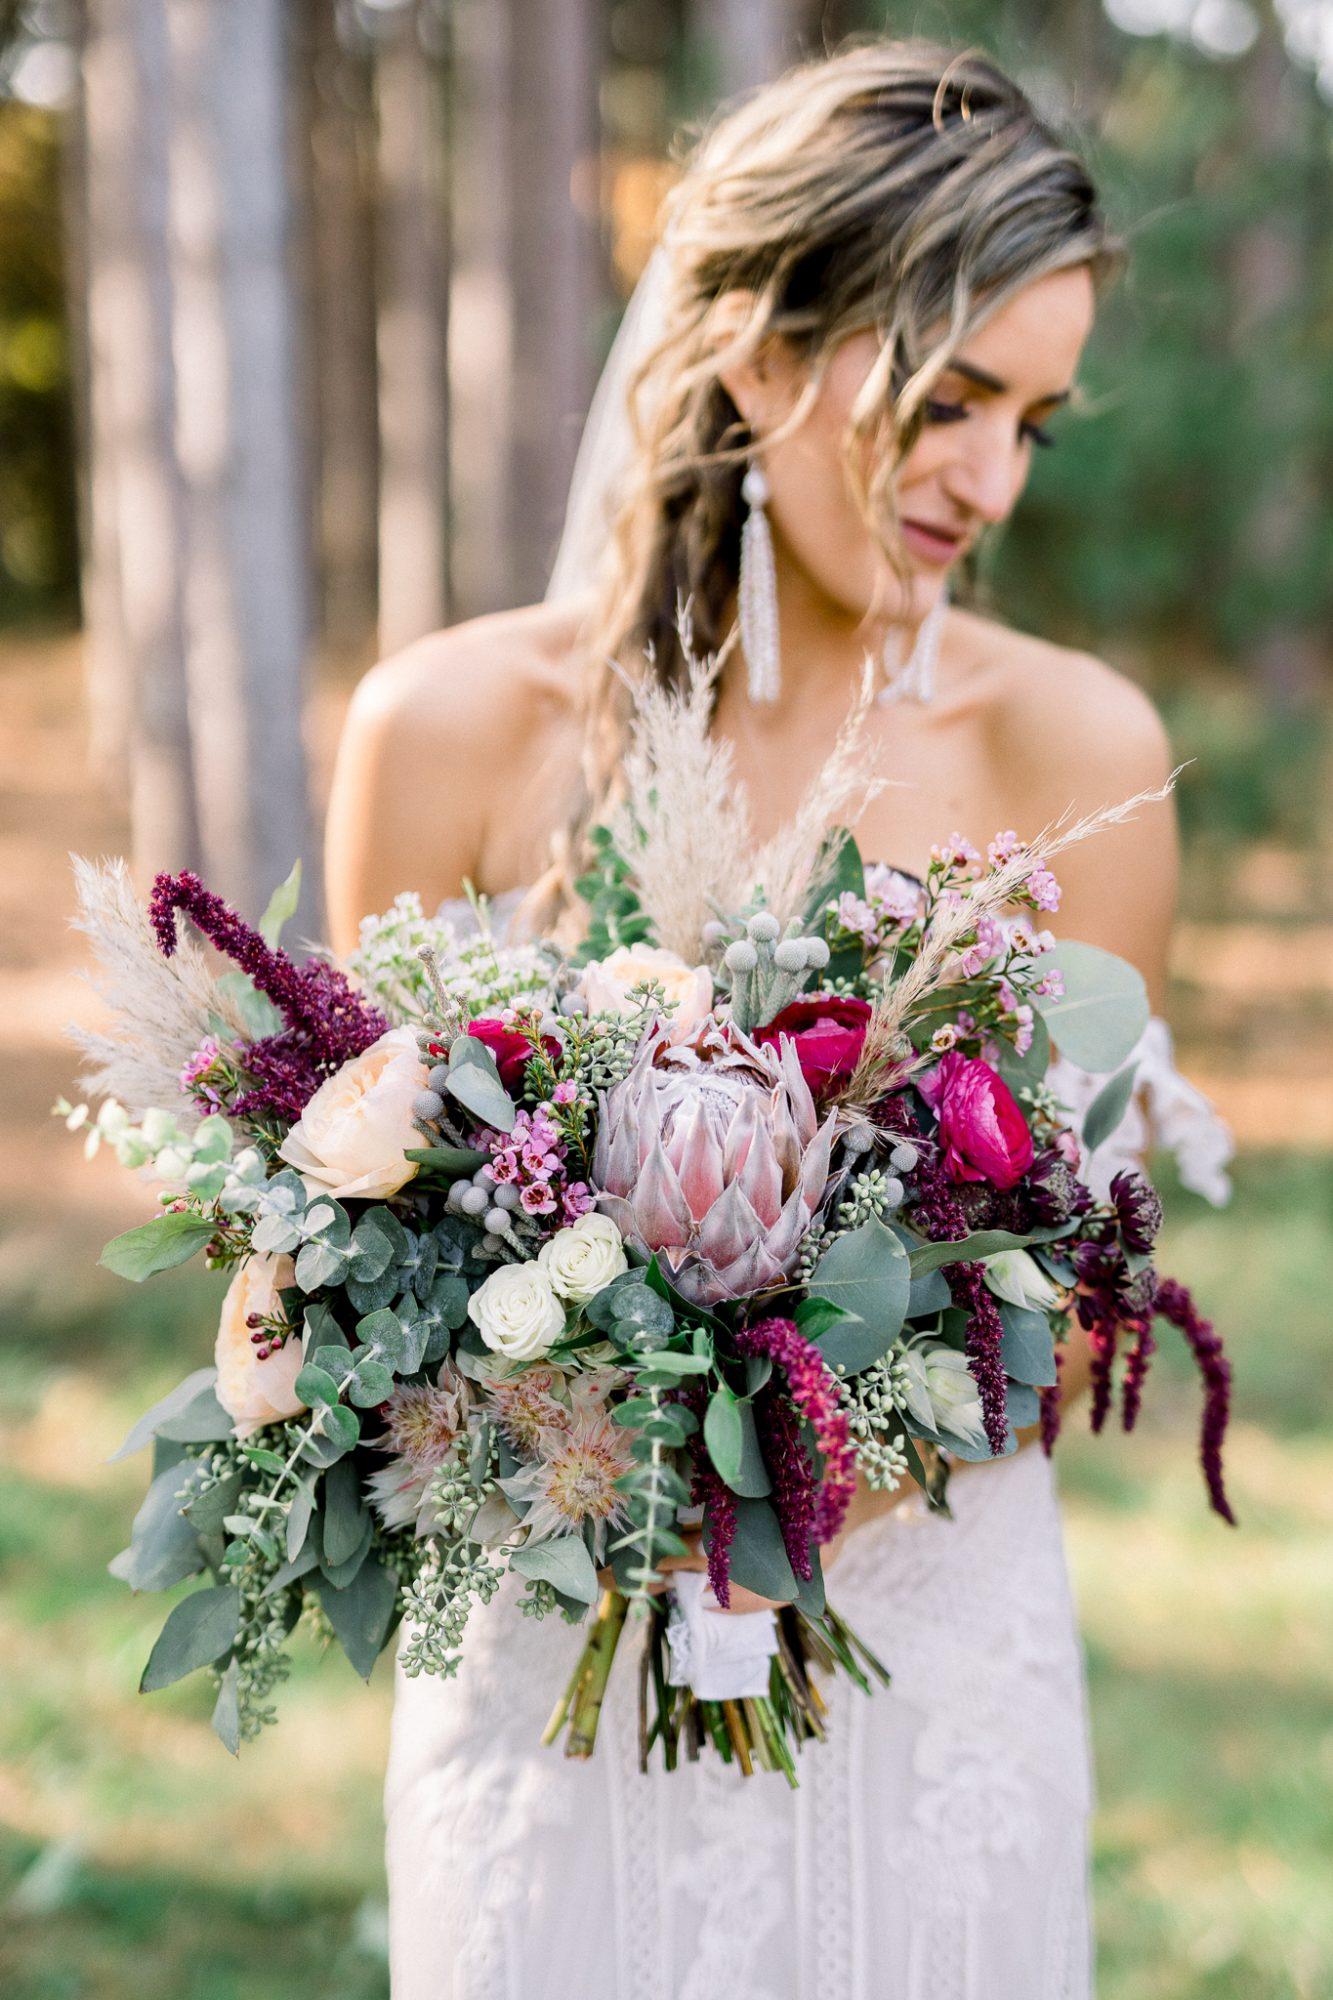 Kailey Billy Fine Art Wedding Photography Pinewood Event Center Cambridge MN 2020 154